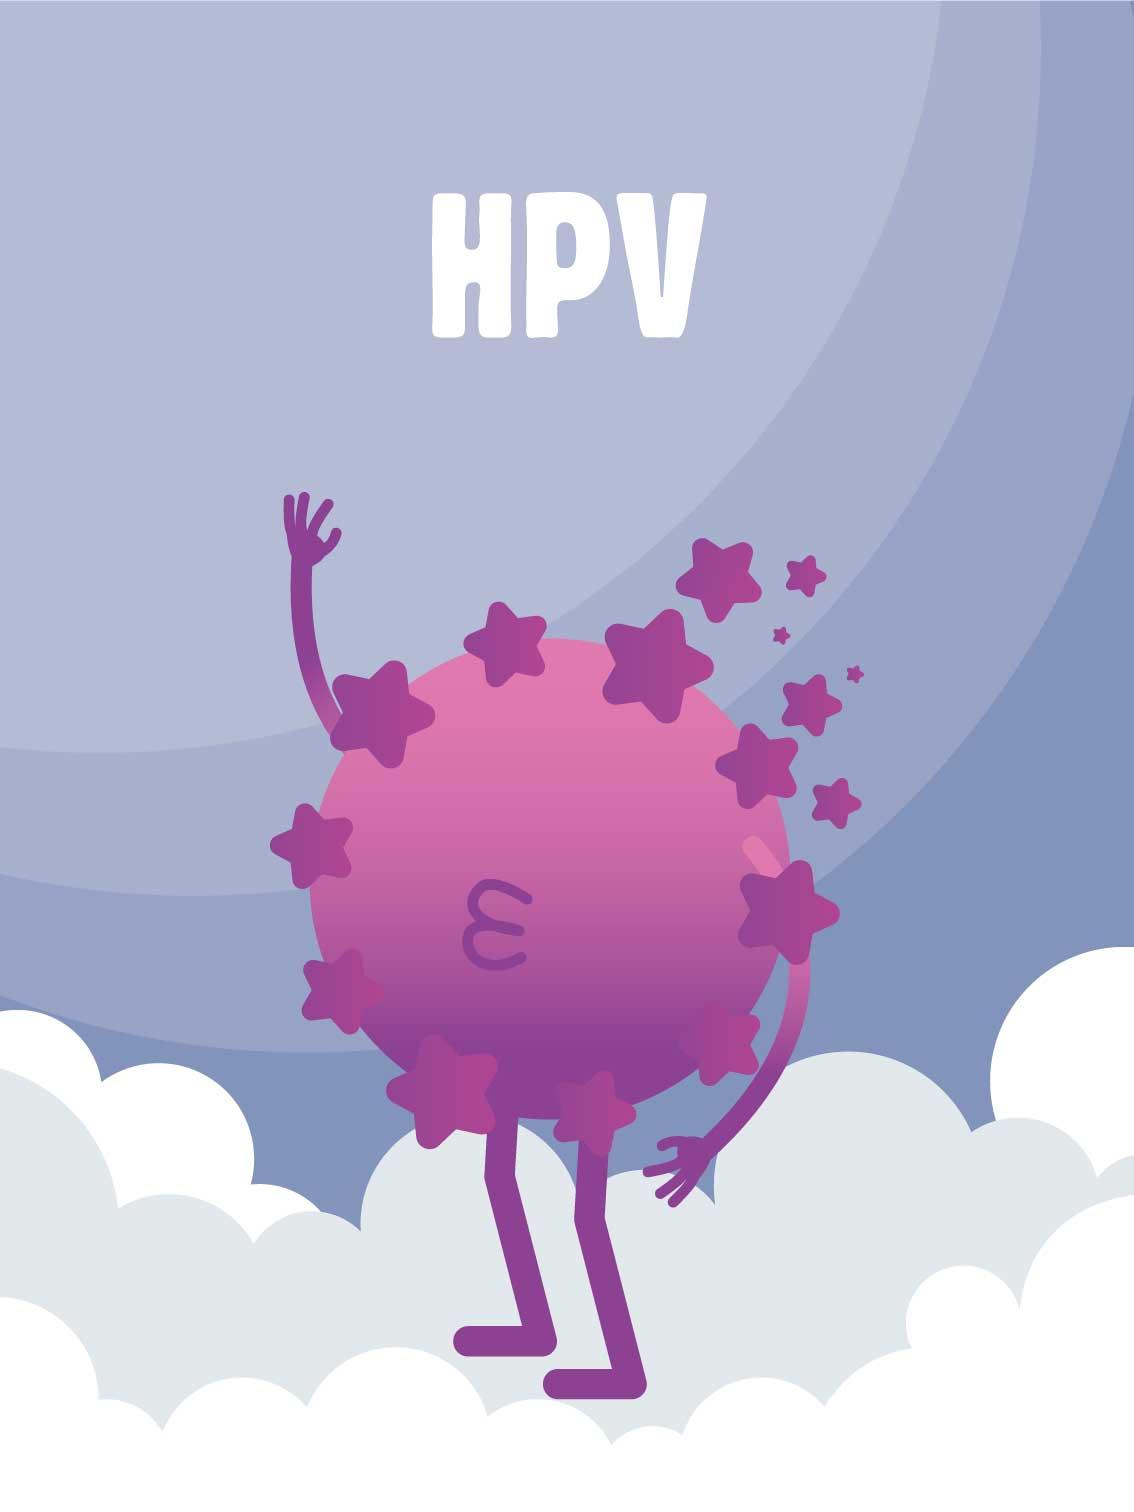 Papillomavirus cest quoi - Hpv cancer percentage